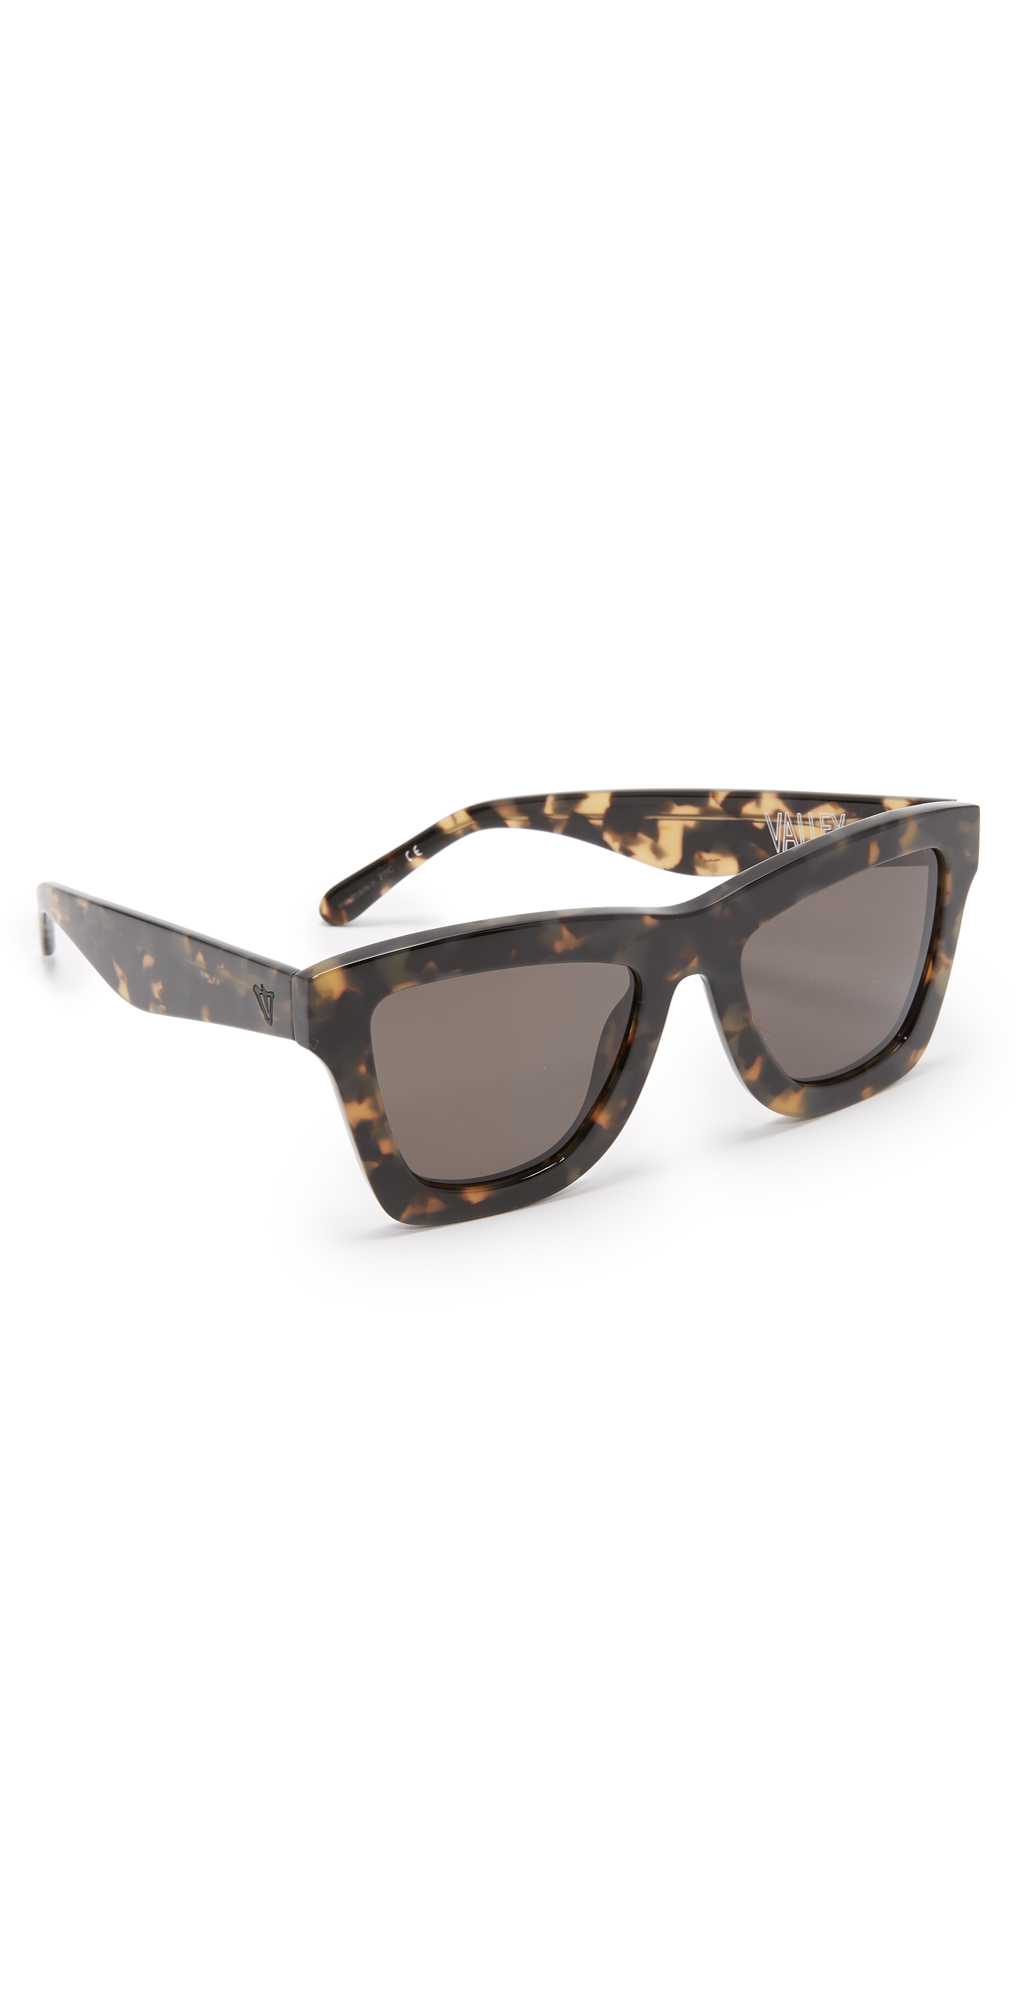 DB II Sunglasses Valley Eyewear